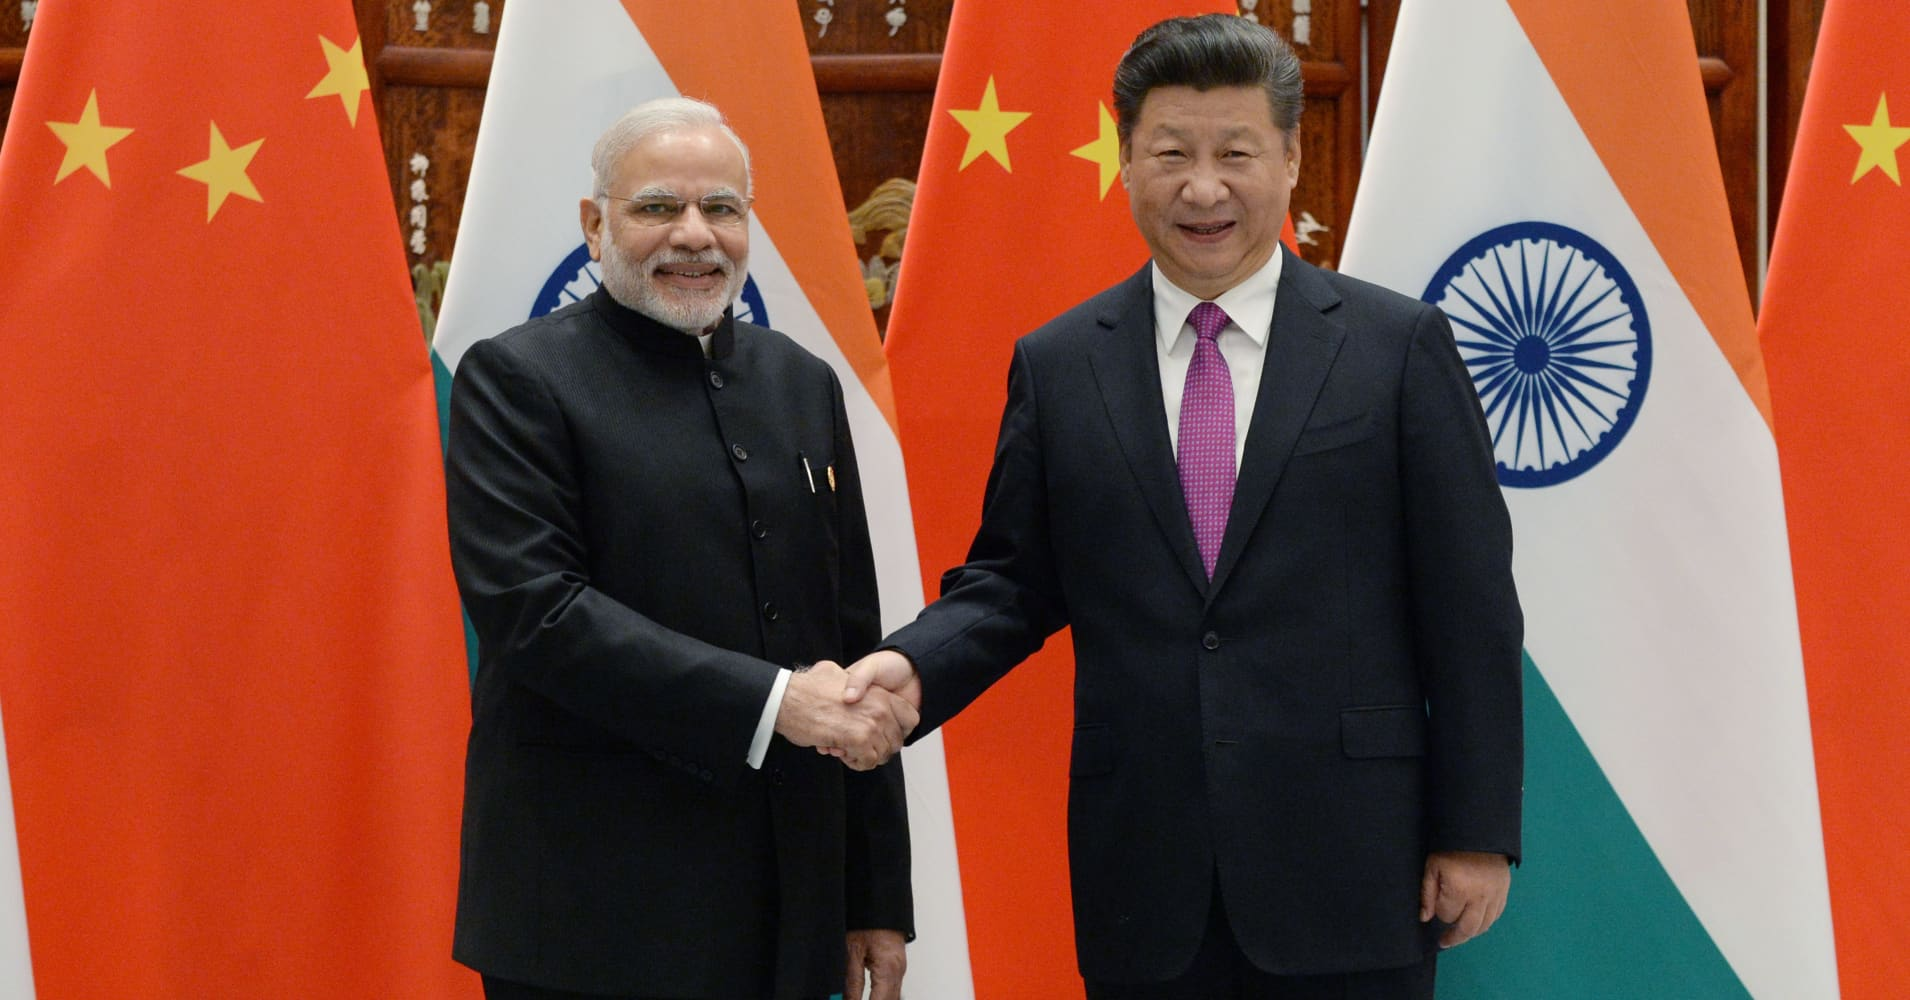 Modi's Davos address took a subtle dig at China, expert says